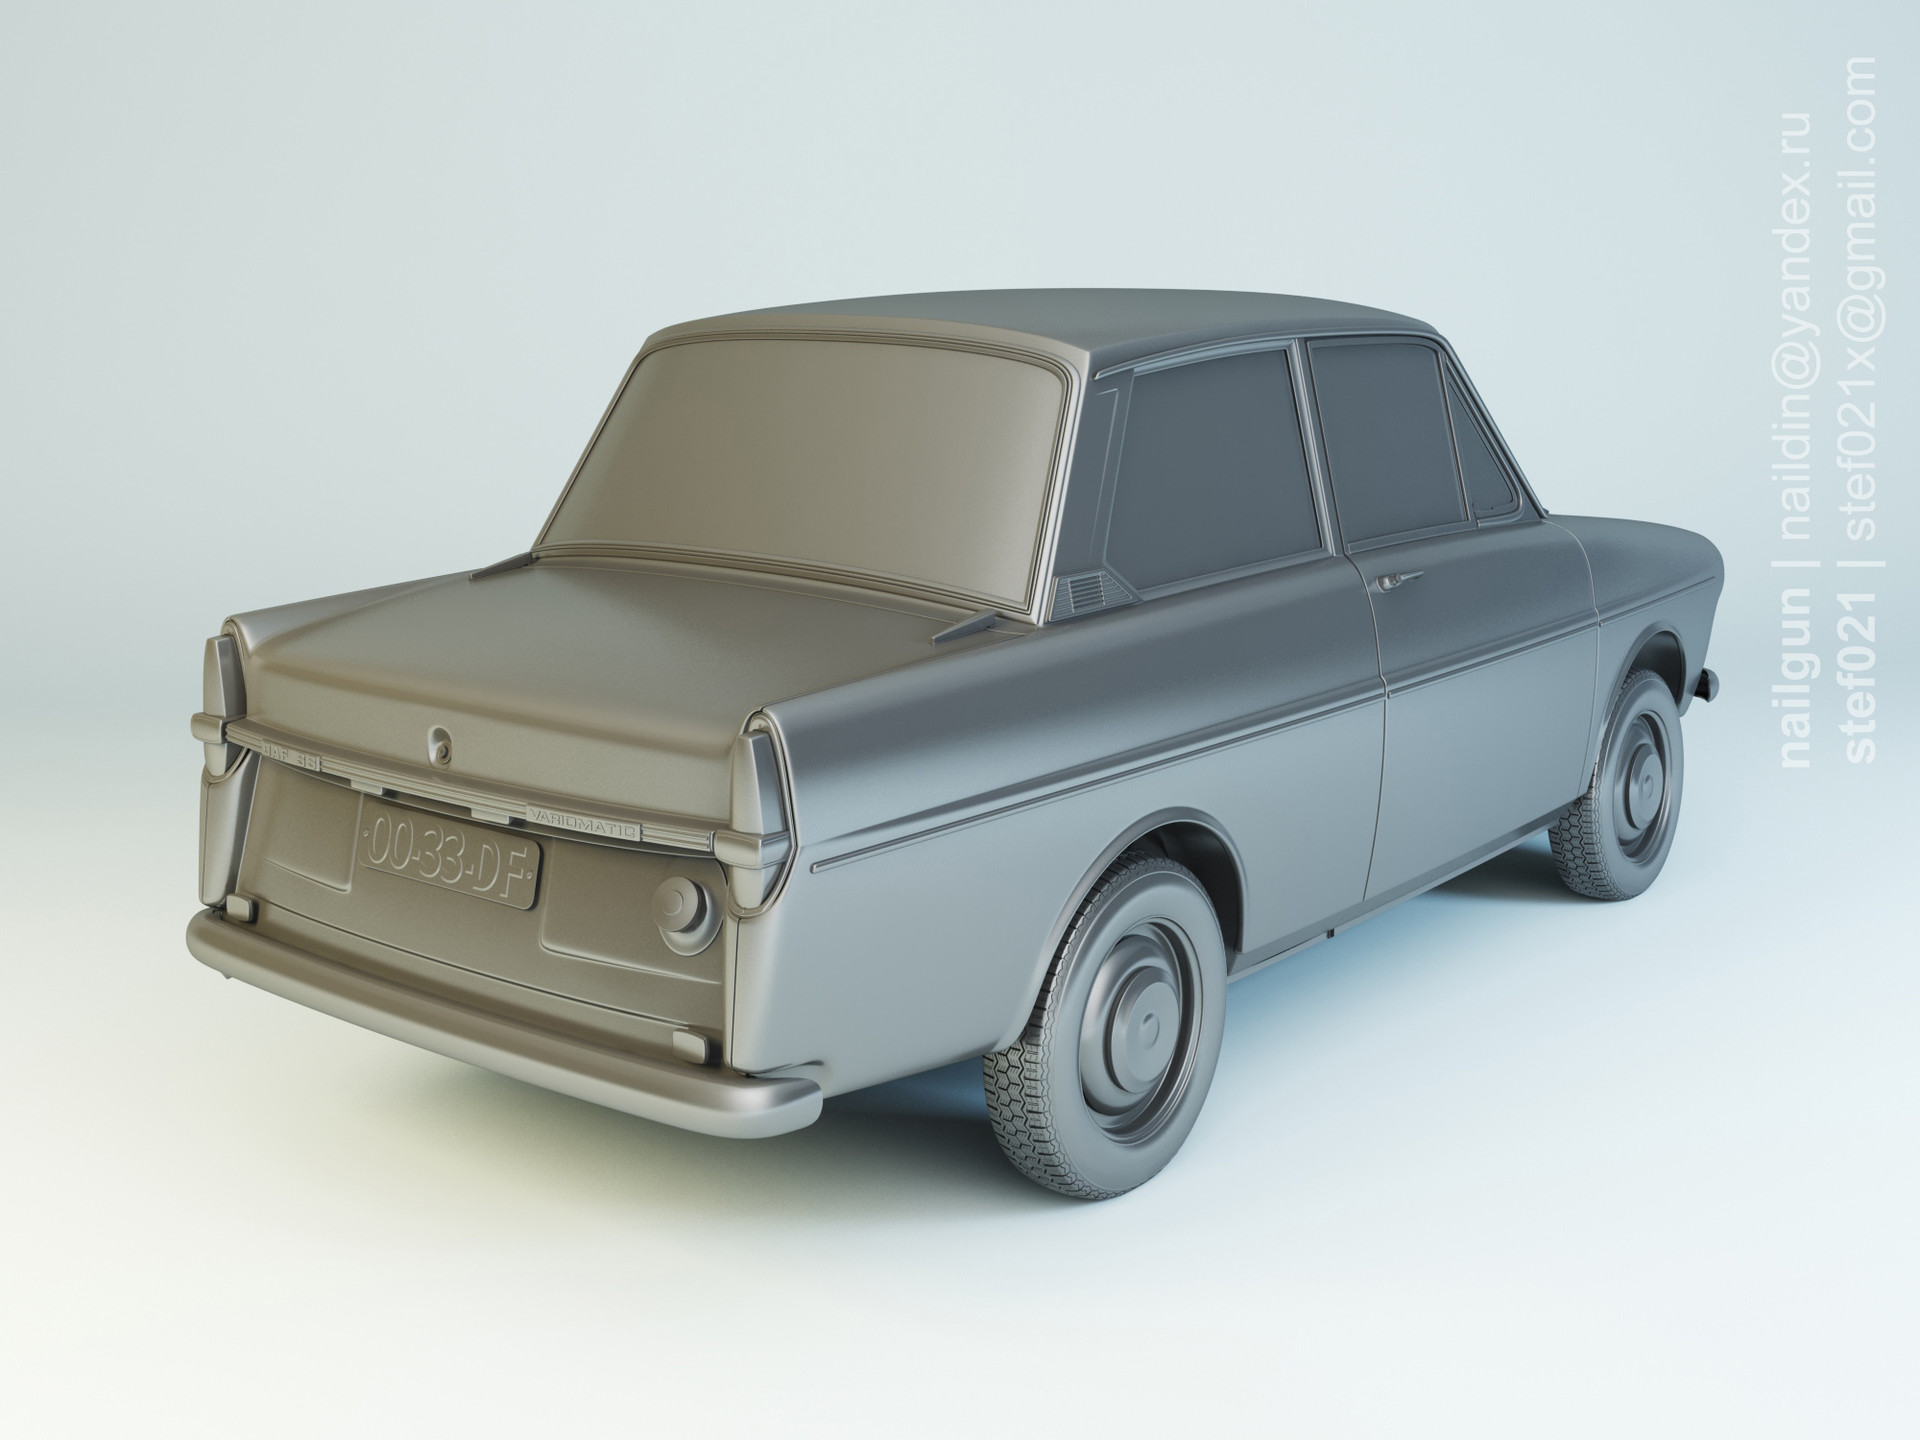 Nail khusnutdinov pwc 078 000 daf 33 modelling 1